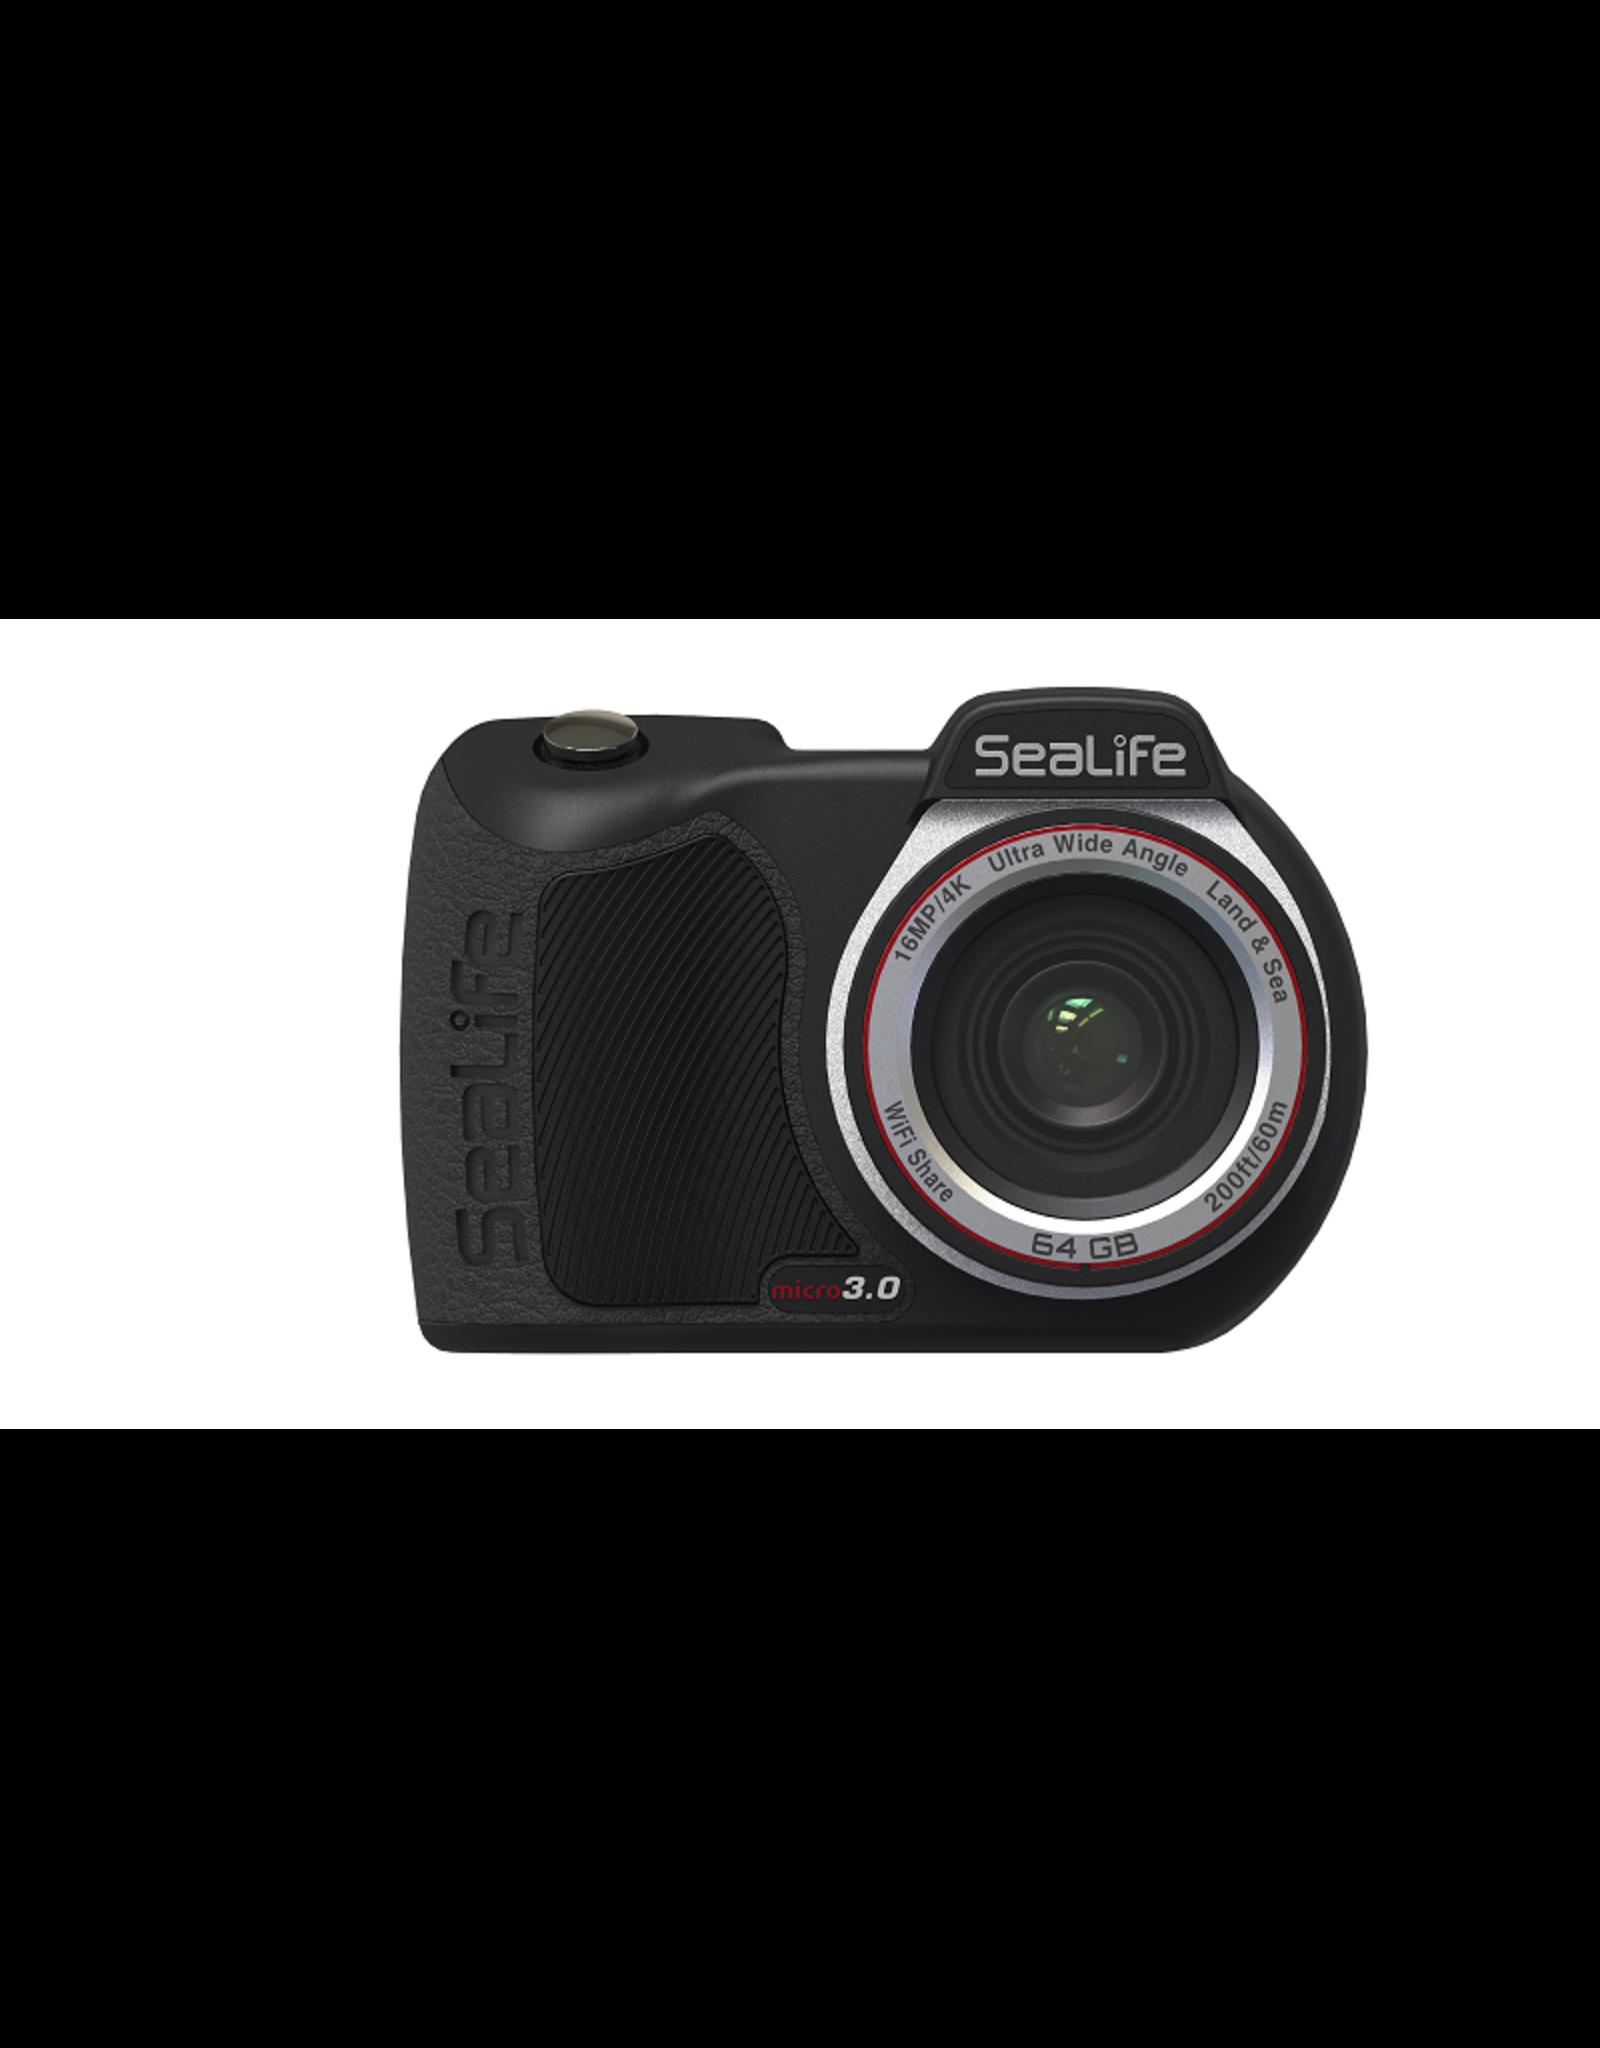 Sealife Sealife Micro 3.0 64GB Pro 3000